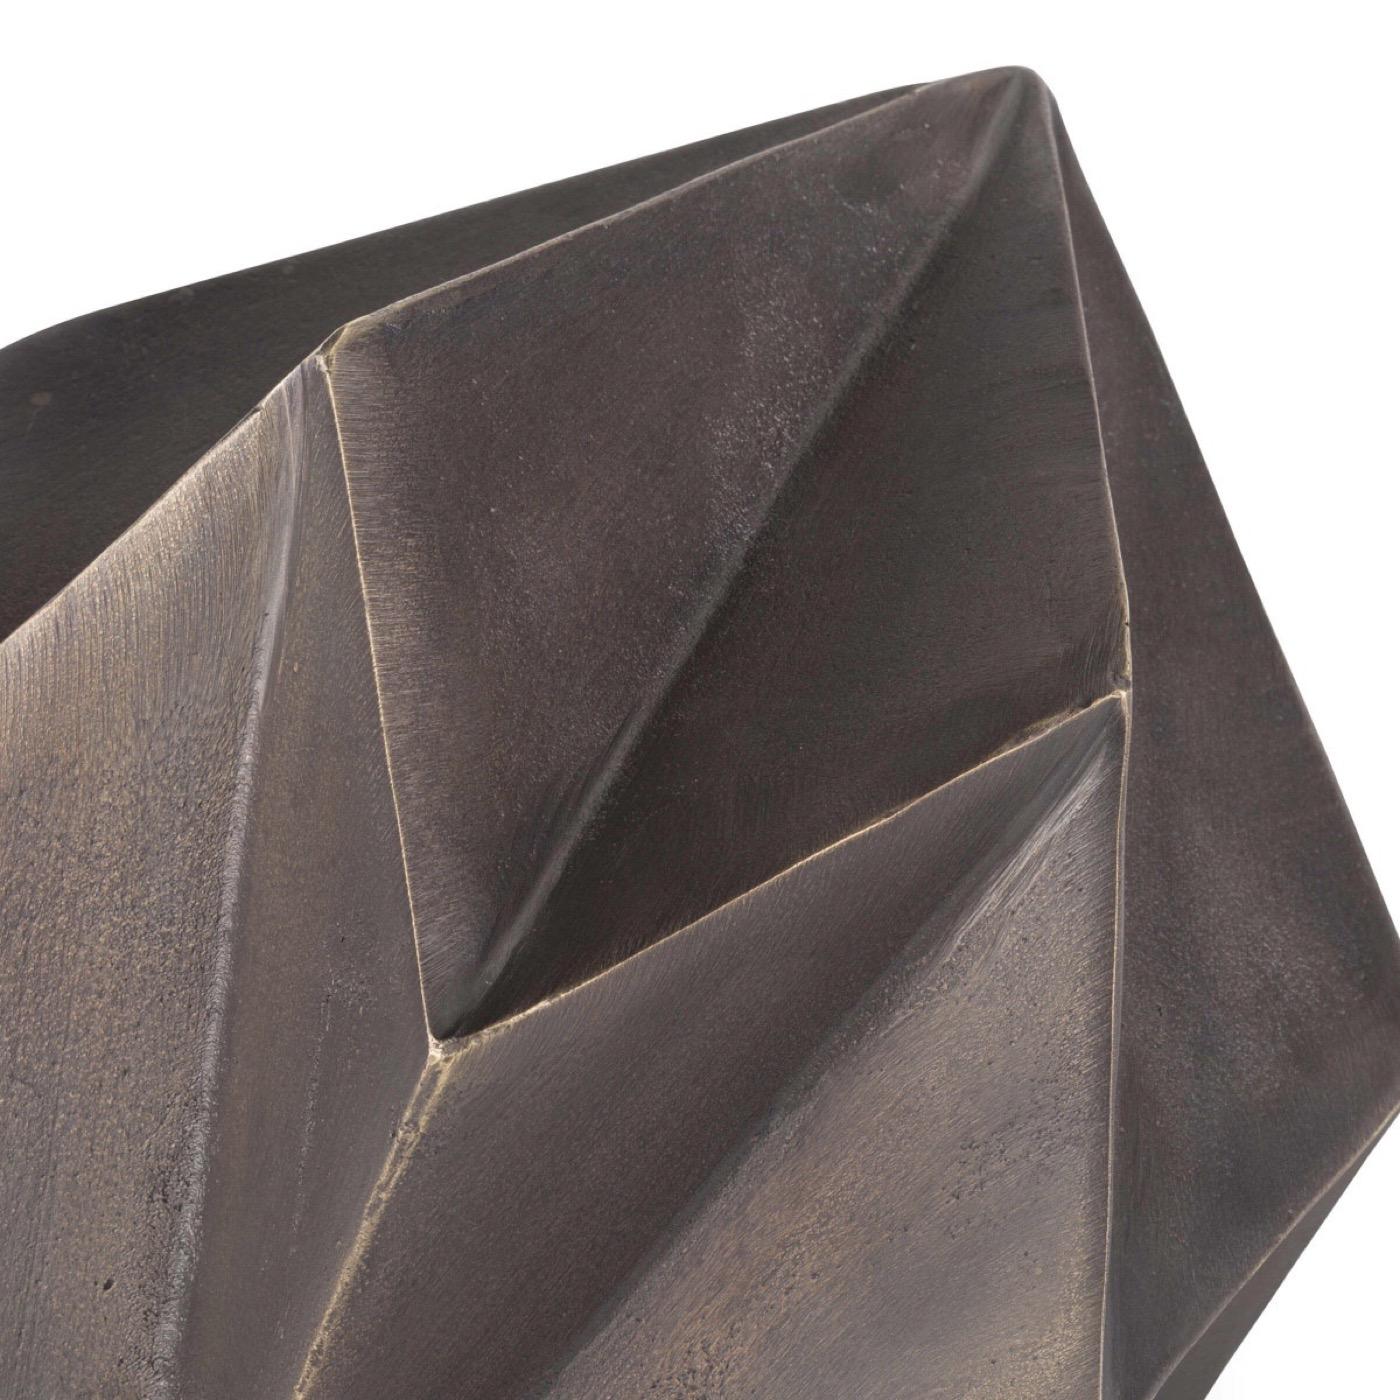 Joby Bronzed Object | Large